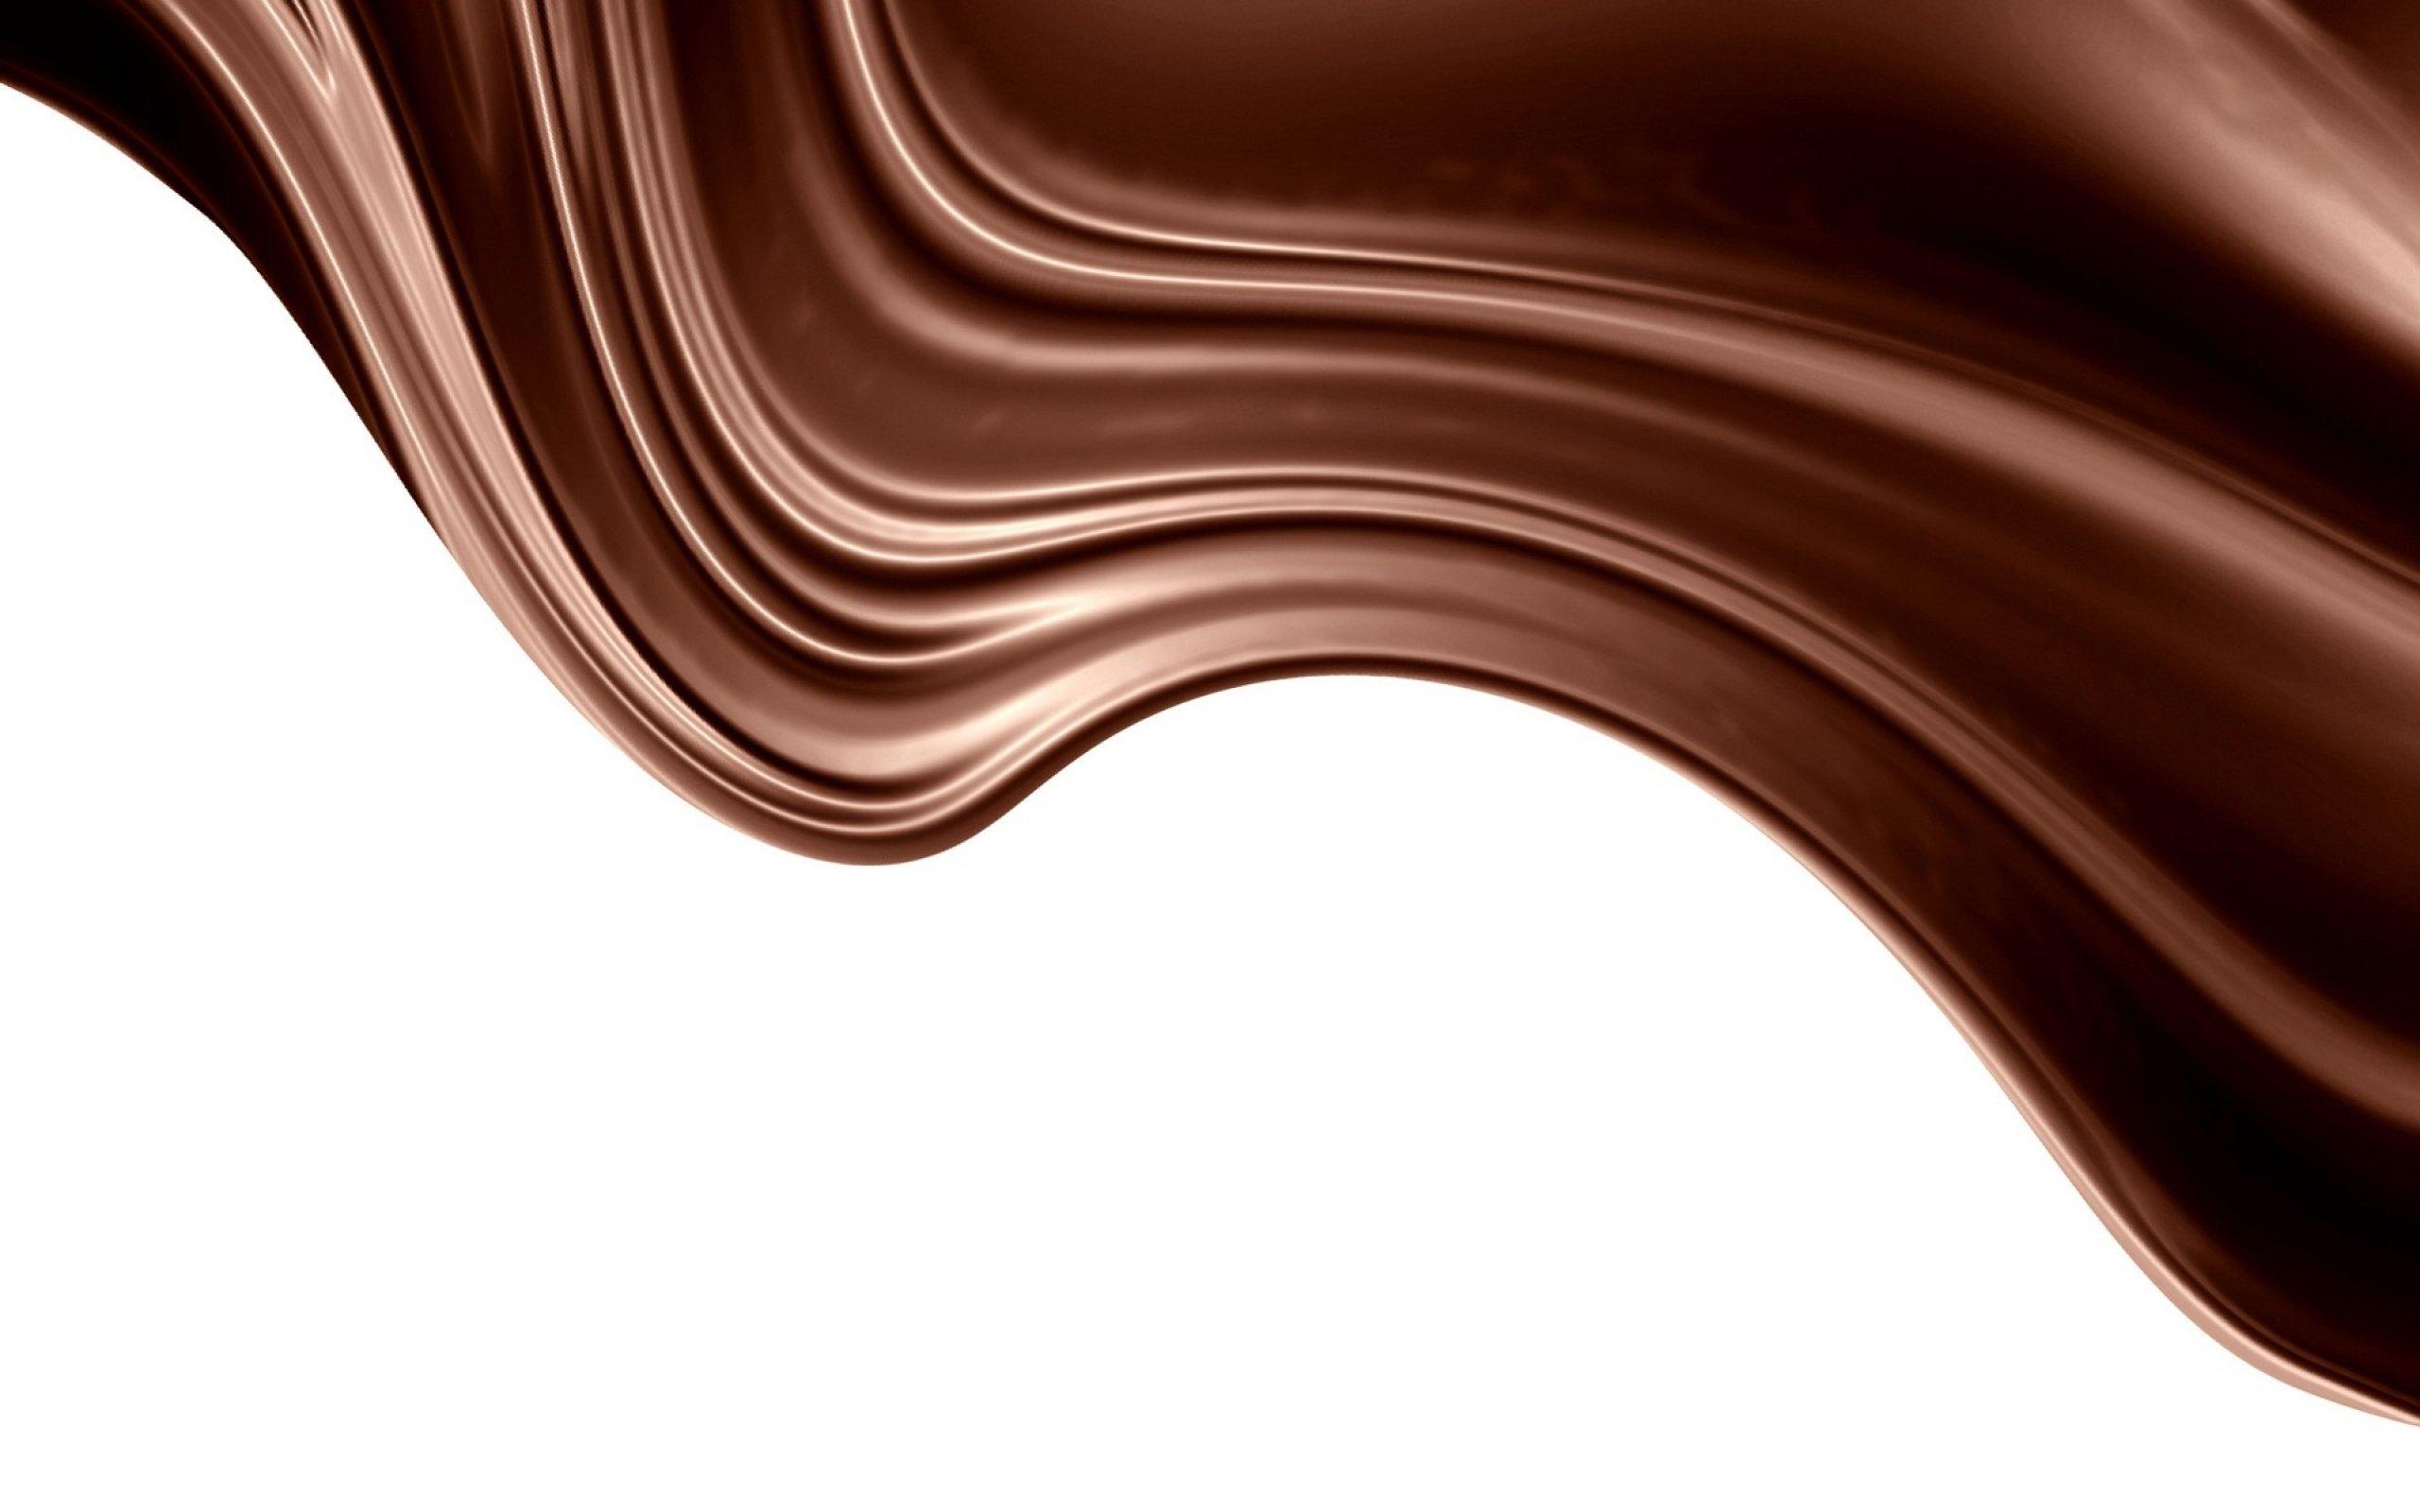 Chocolate HD Wallpaper 2560x1600